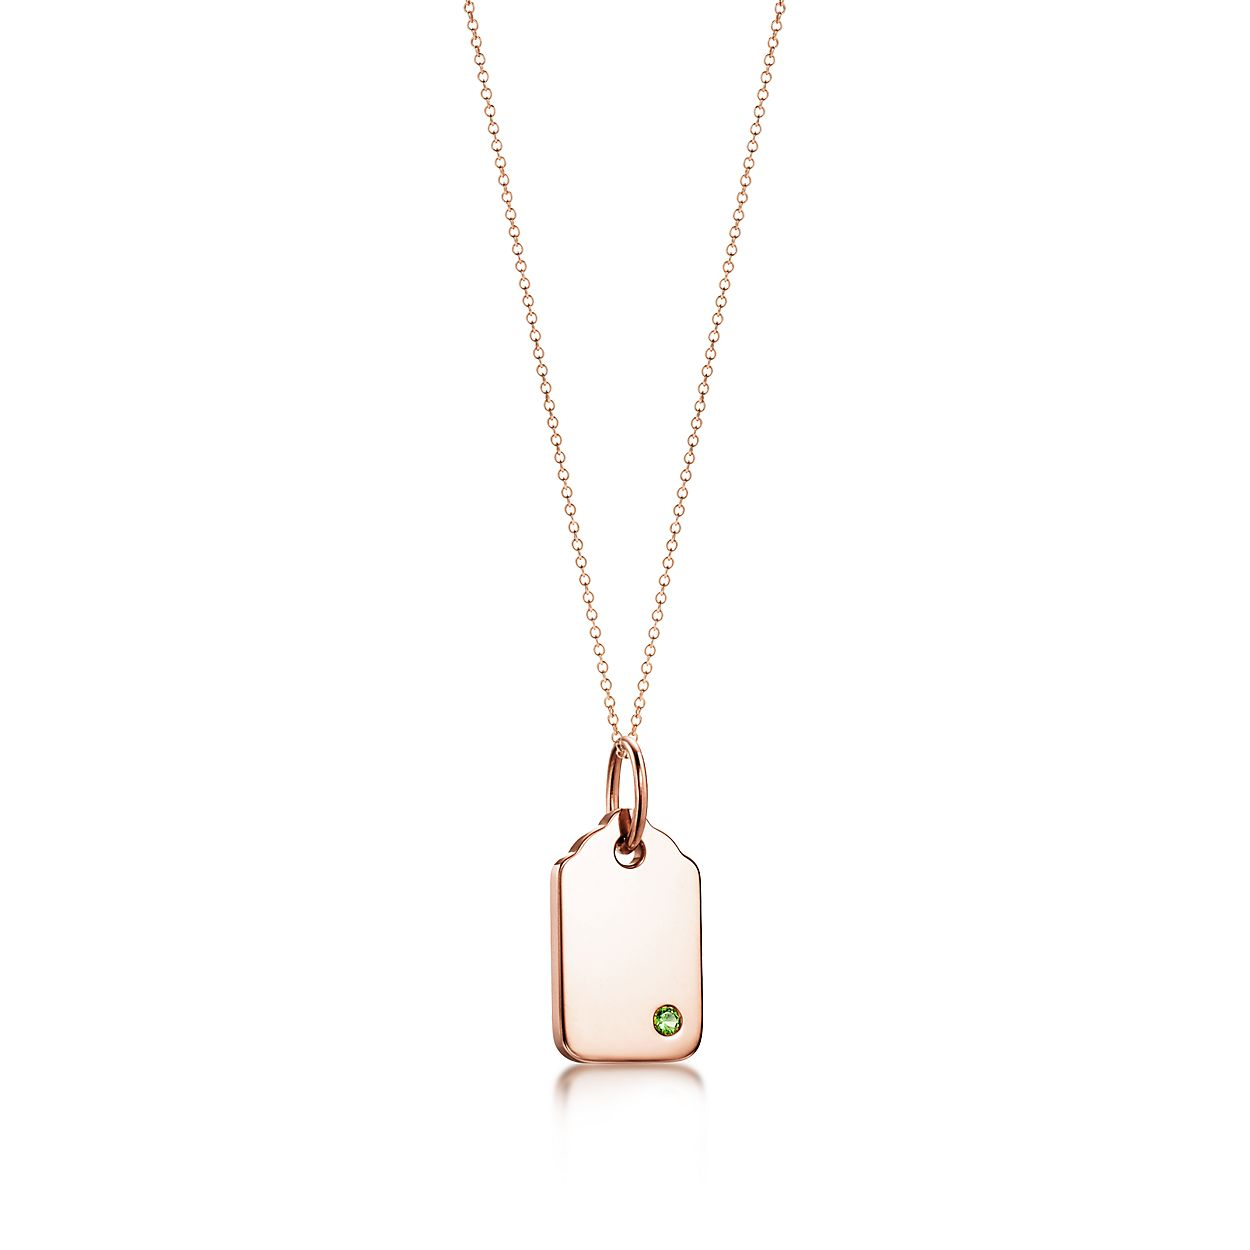 Plaque arrondie Tiffany Charms en or rose 18 carats avec tsavorite ... adbbc1406730